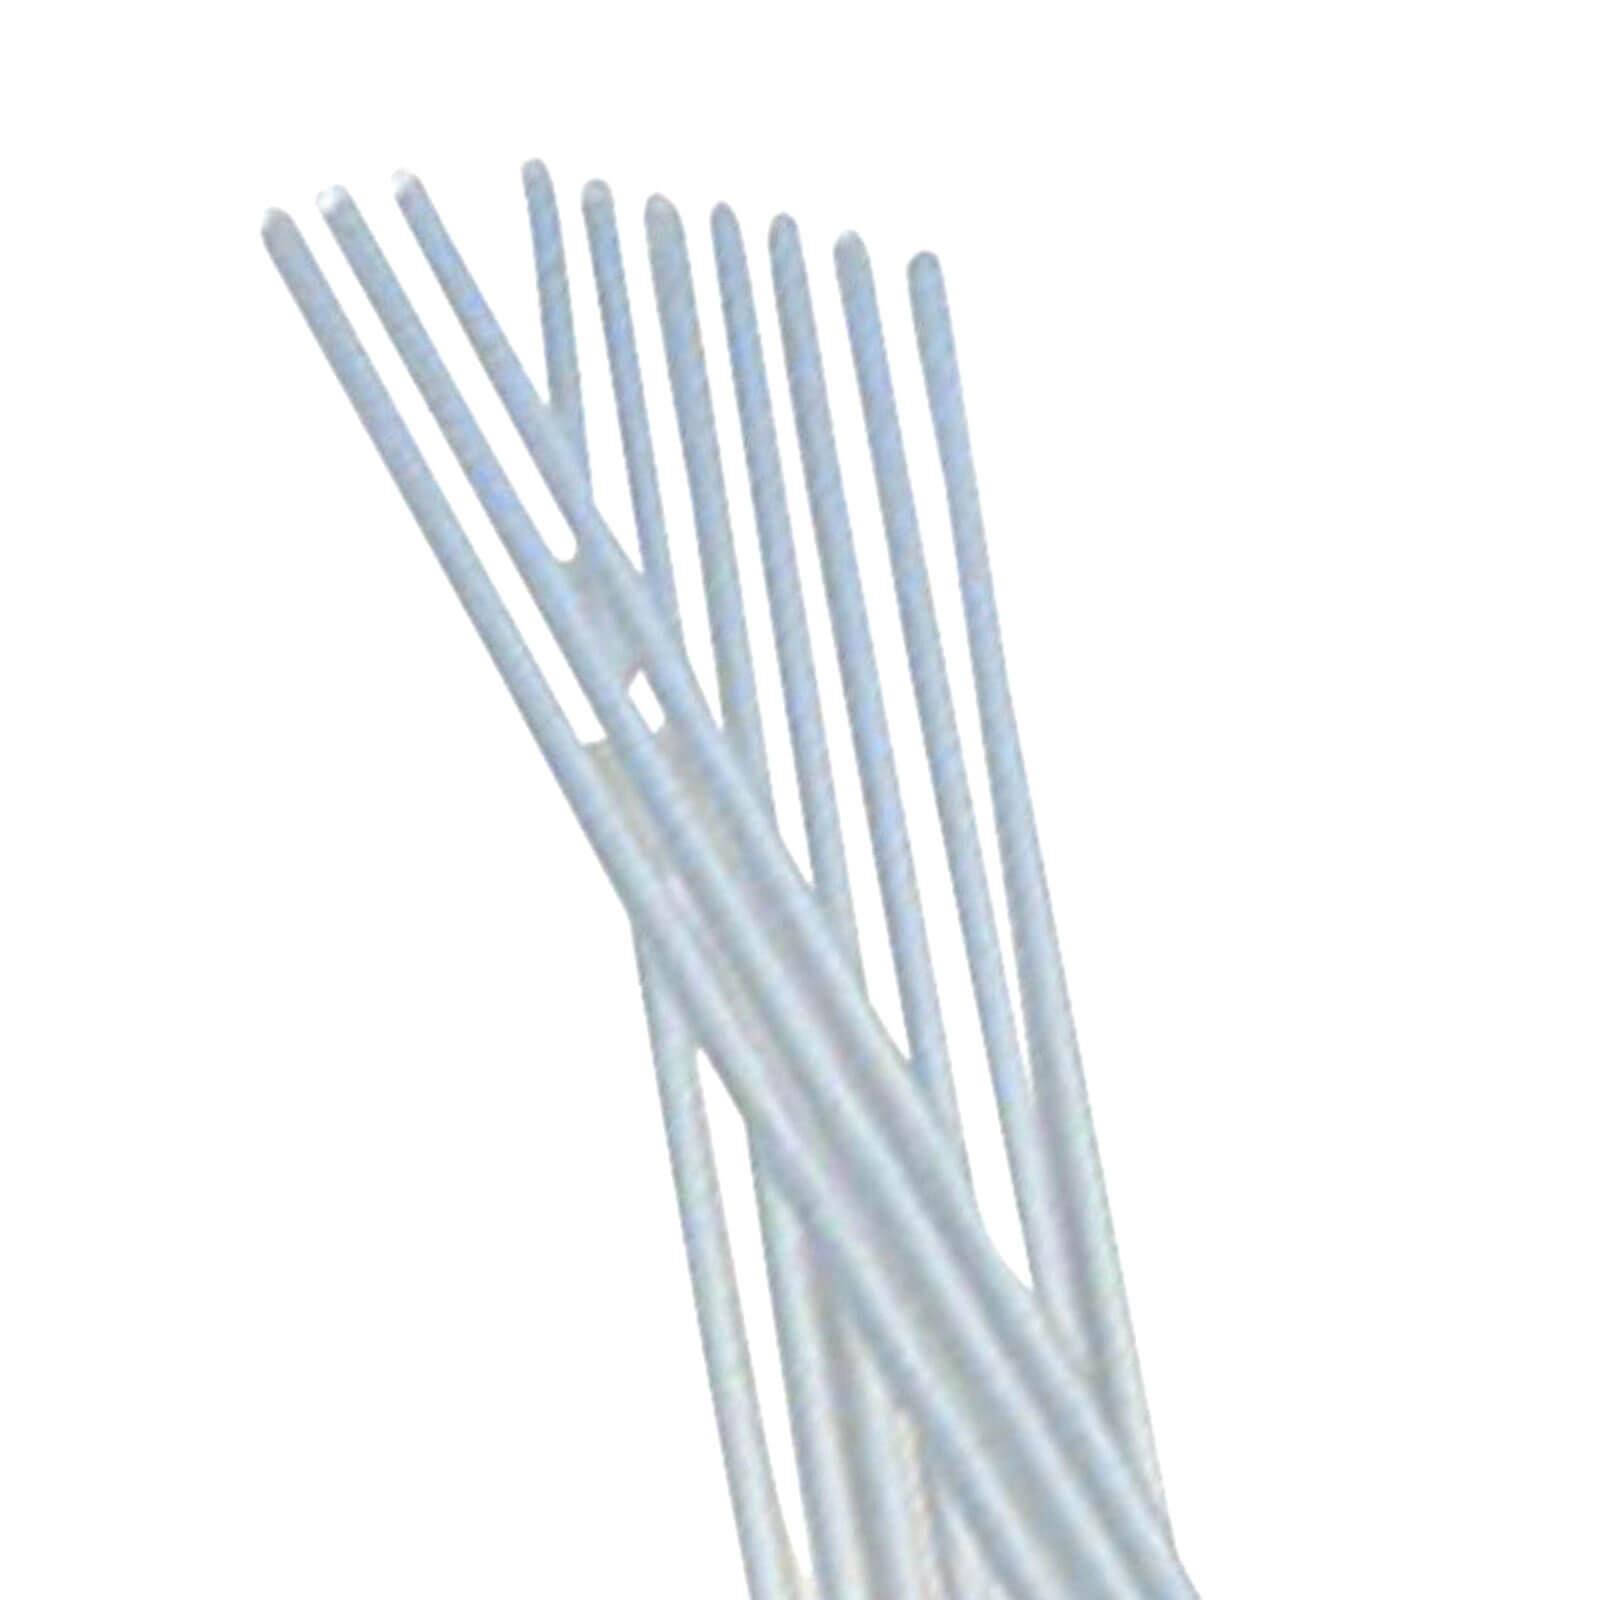 Steinel Clear Welding Rod Rigid PVC for Heat Guns